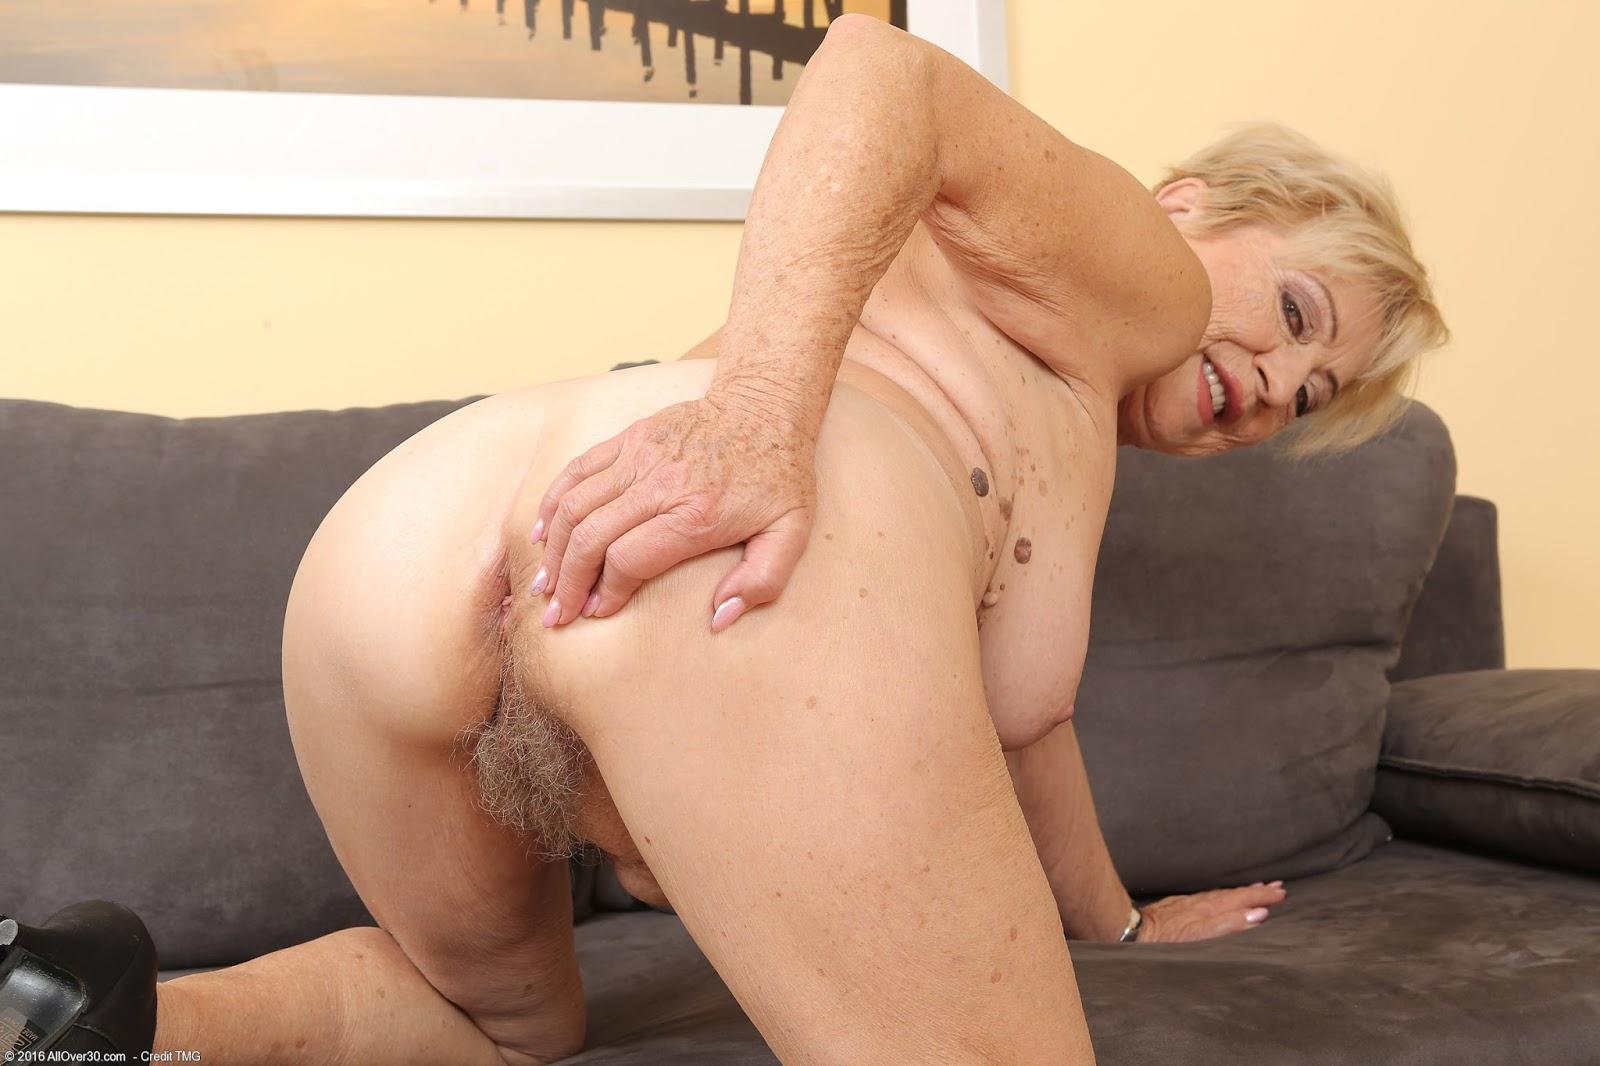 Titten nude old granny.blogspot